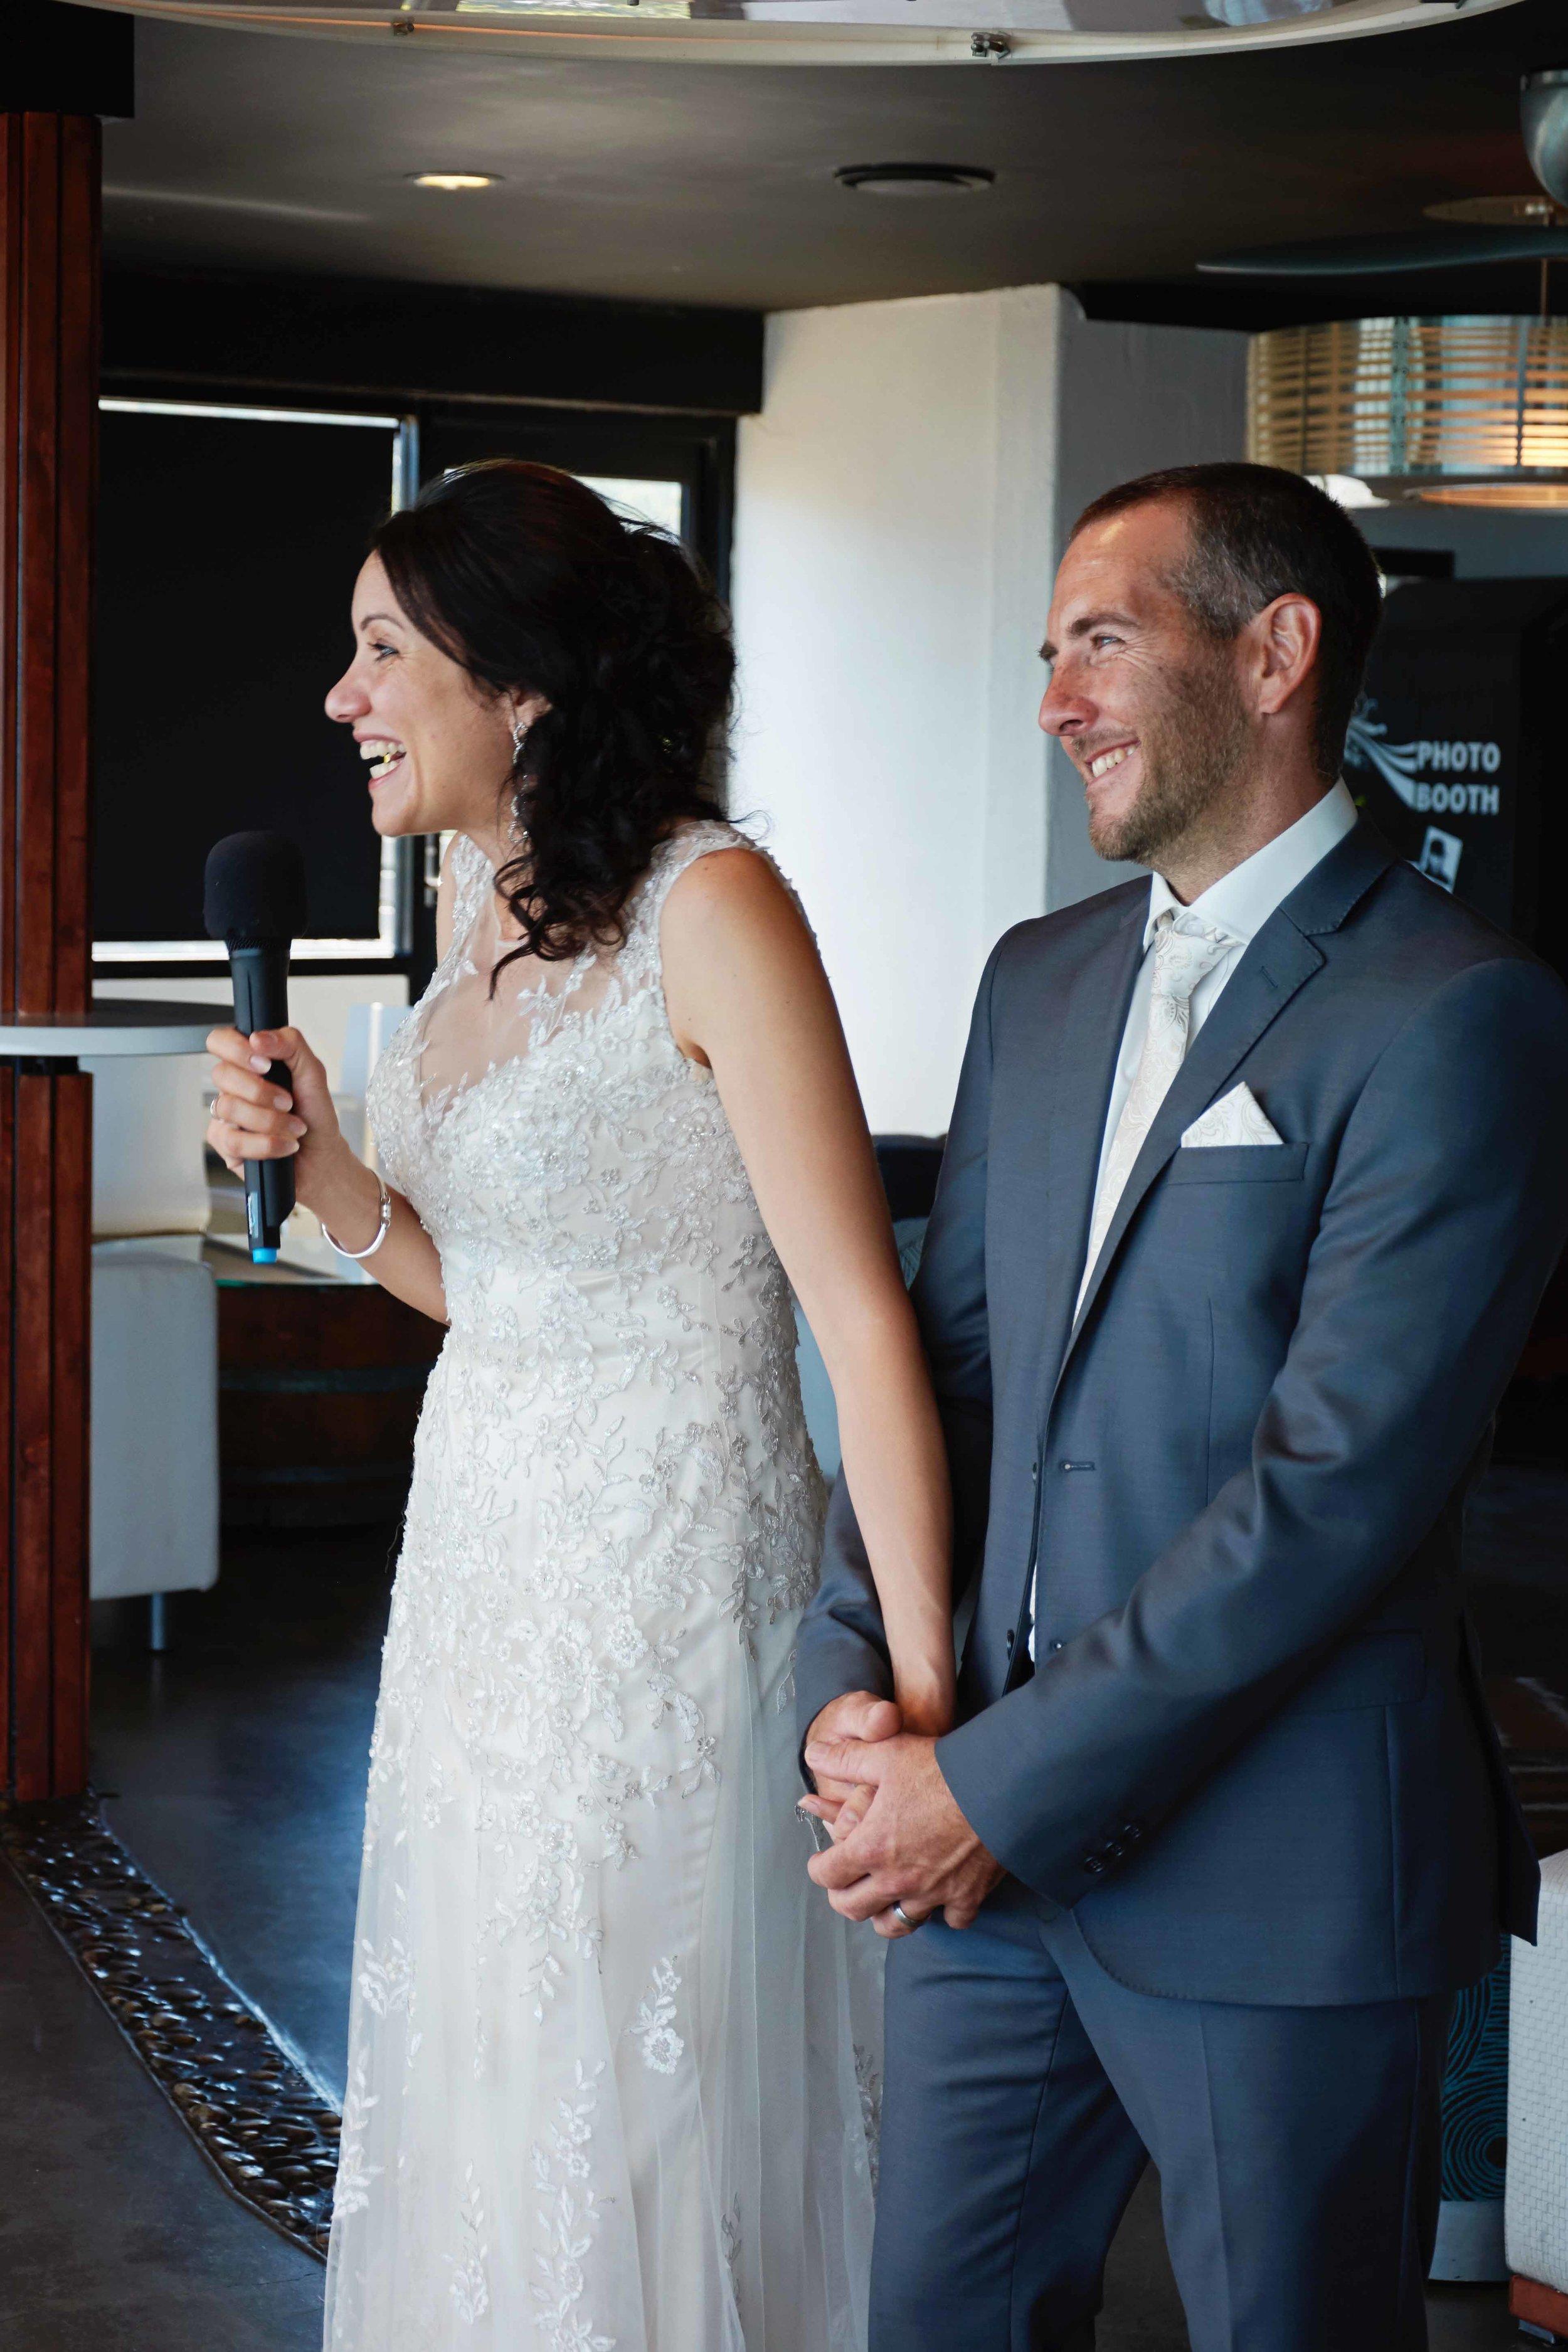 sorrento-wedding-photography-all-smiles-marissa-jade-photography-96.jpg